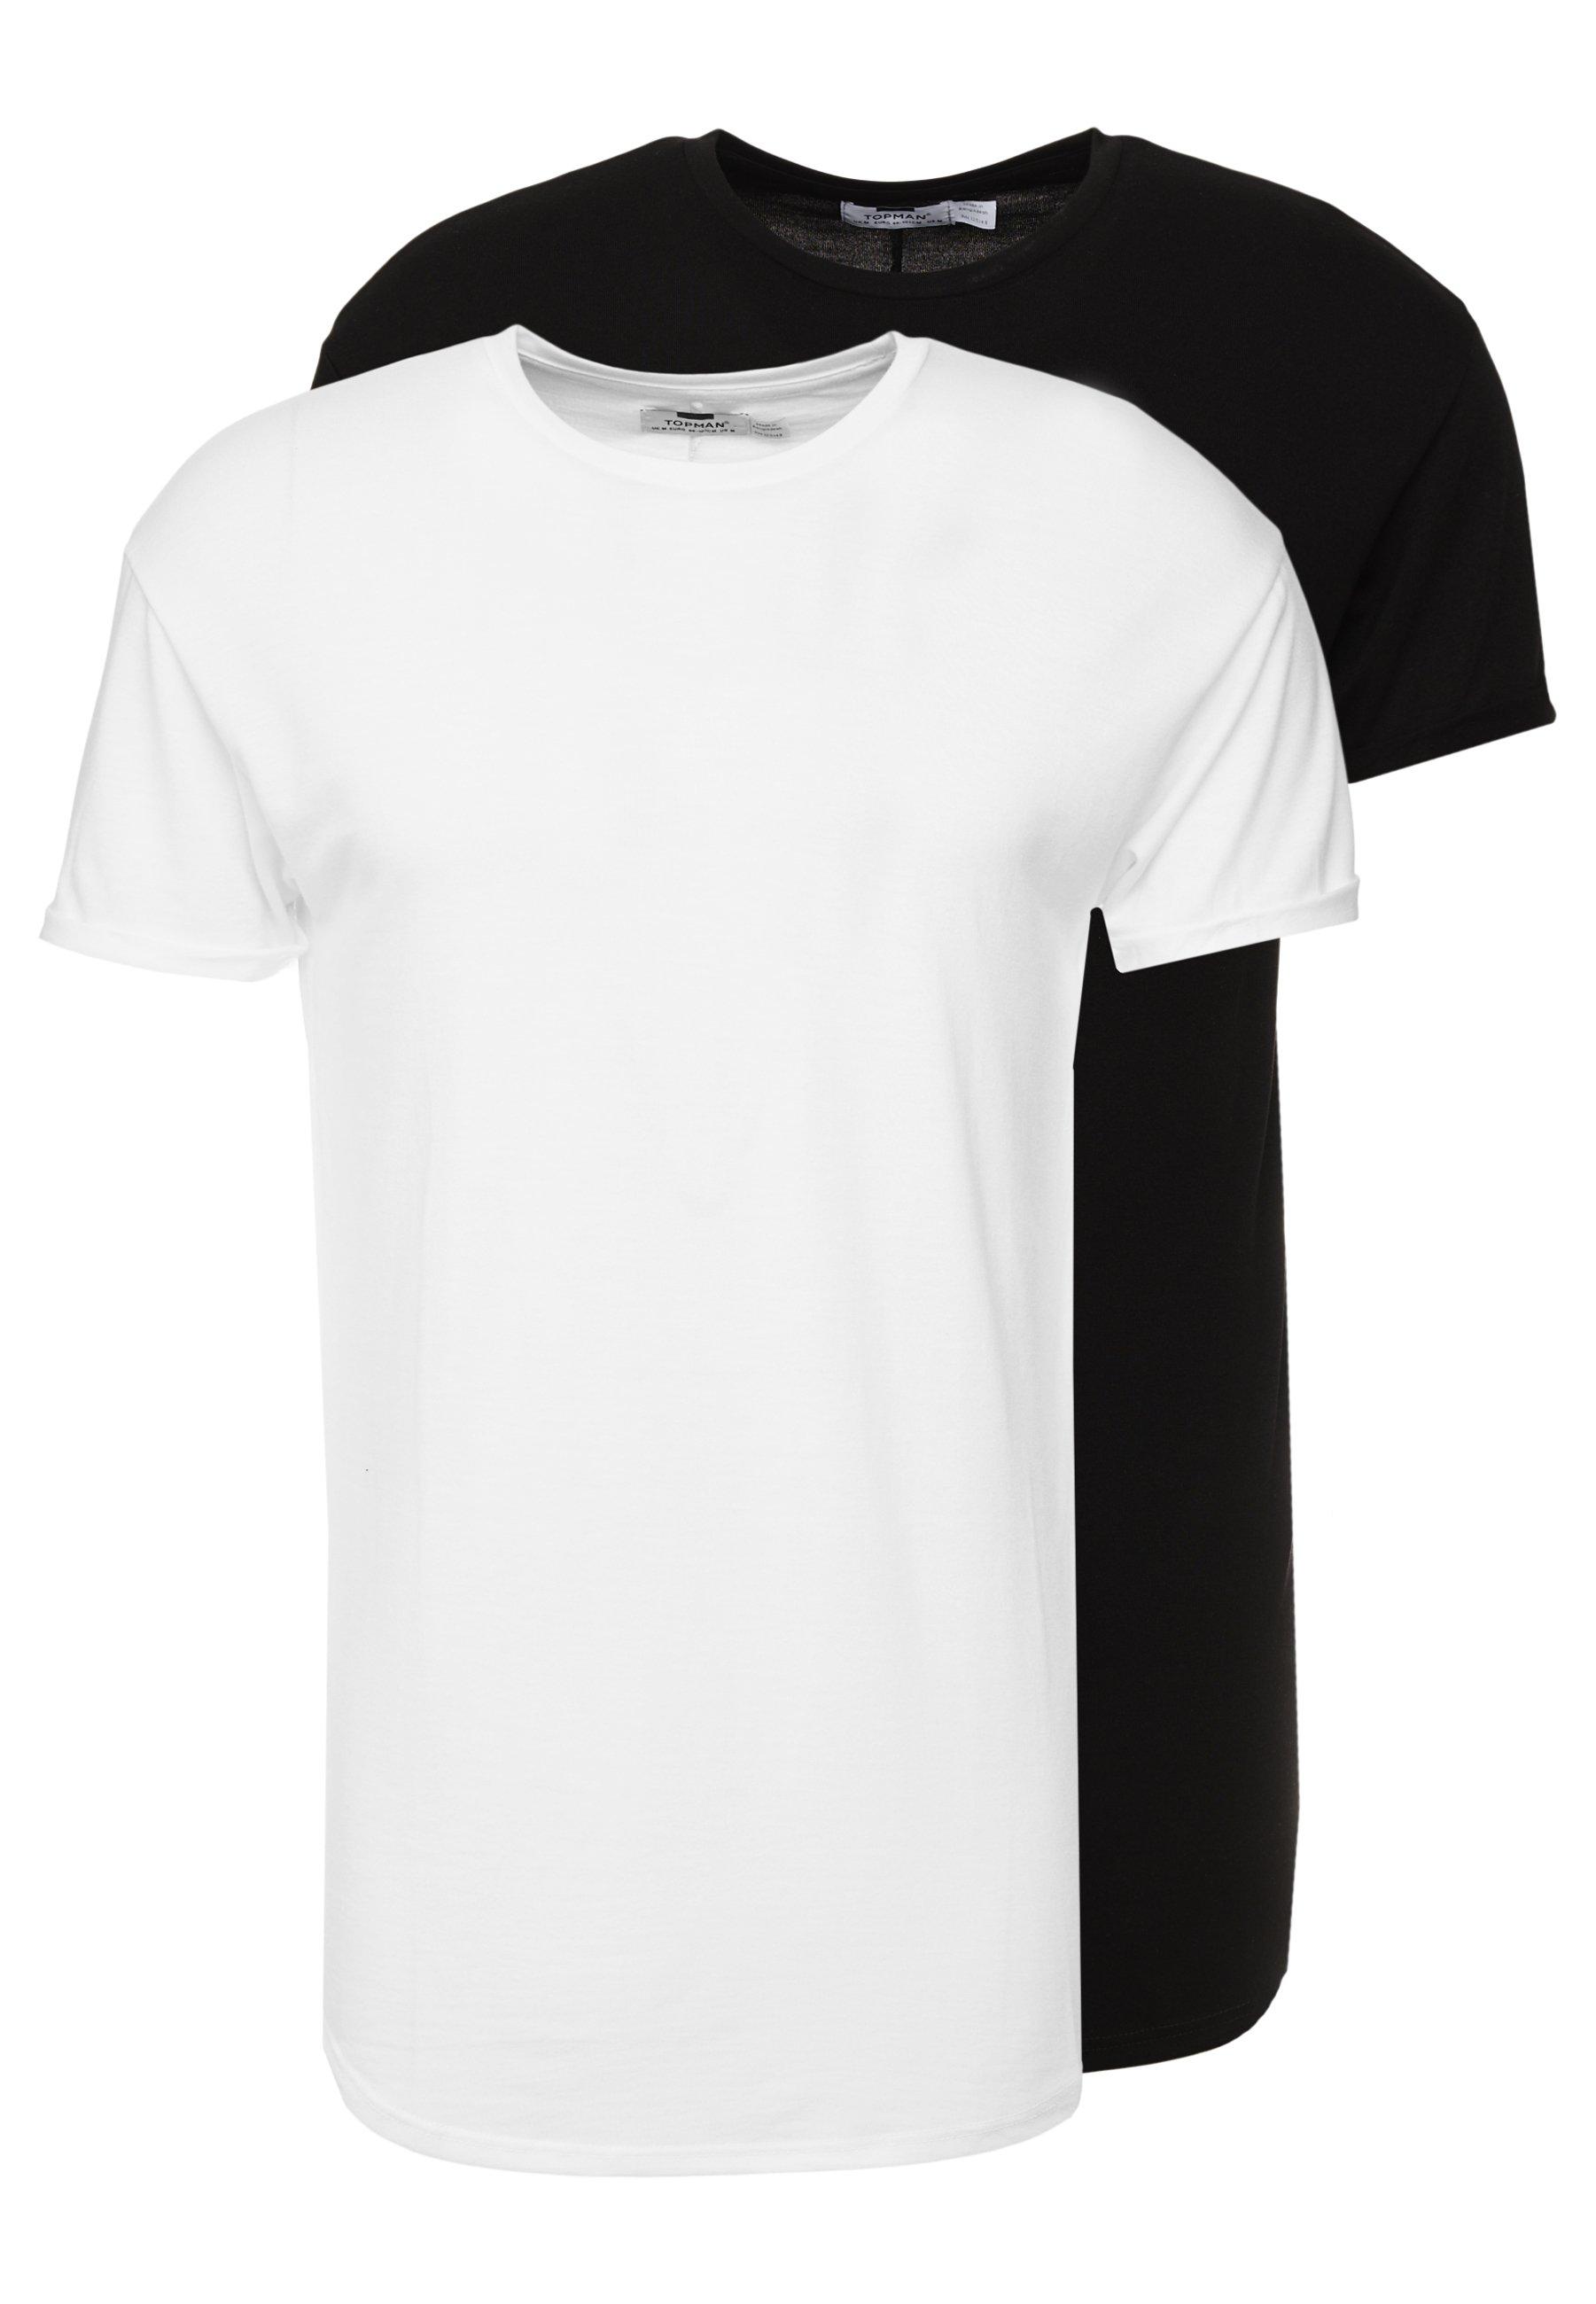 PackT white 2 Scotty shirt Black Basique Topman Ybf7gvy6